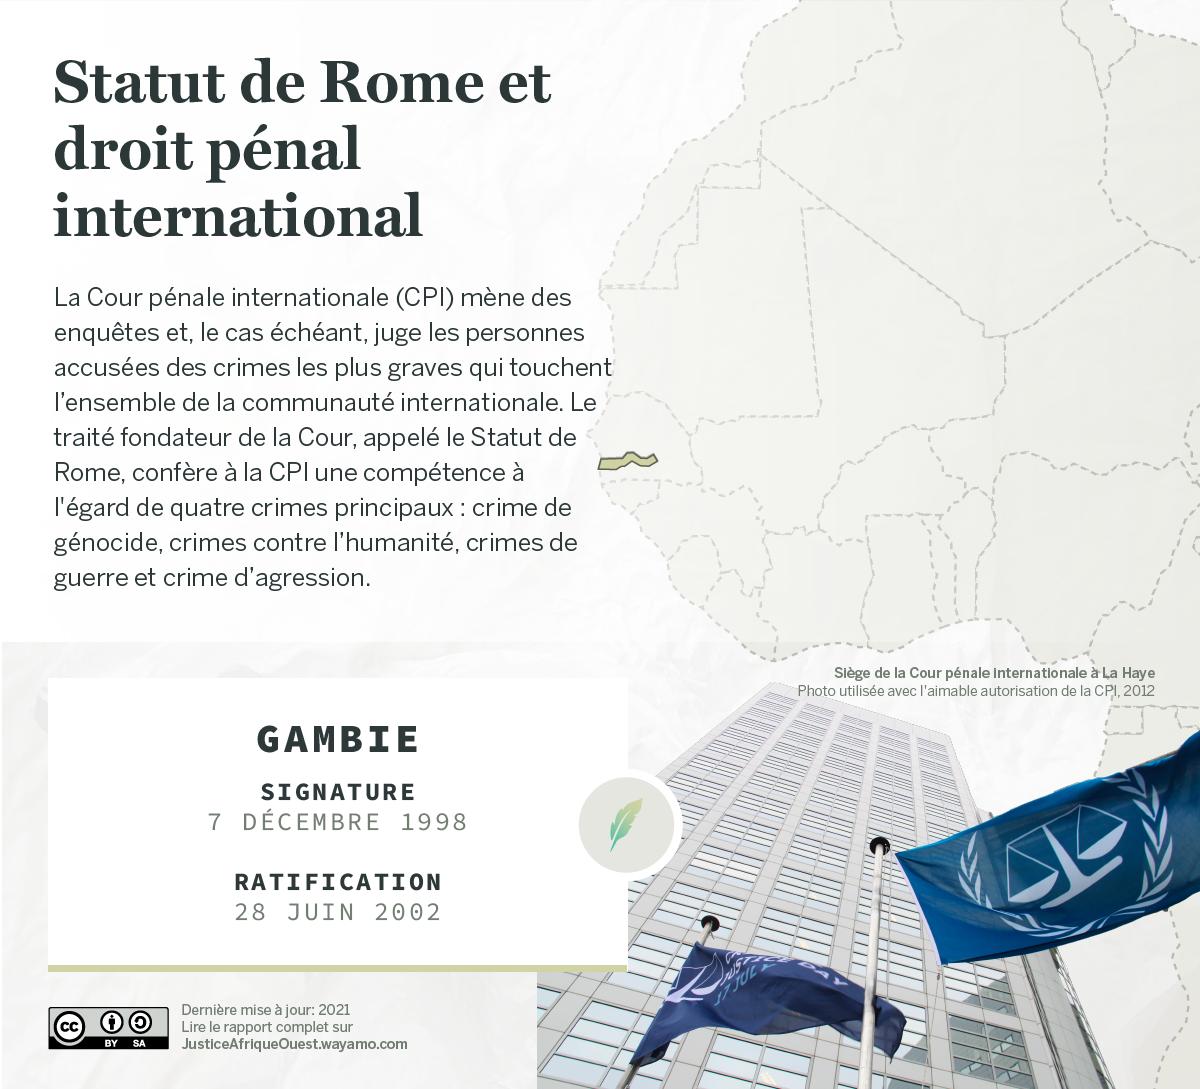 GAMBIE_Statut de Rome - Wayamo Foundation (CC BY-SA 4.0)